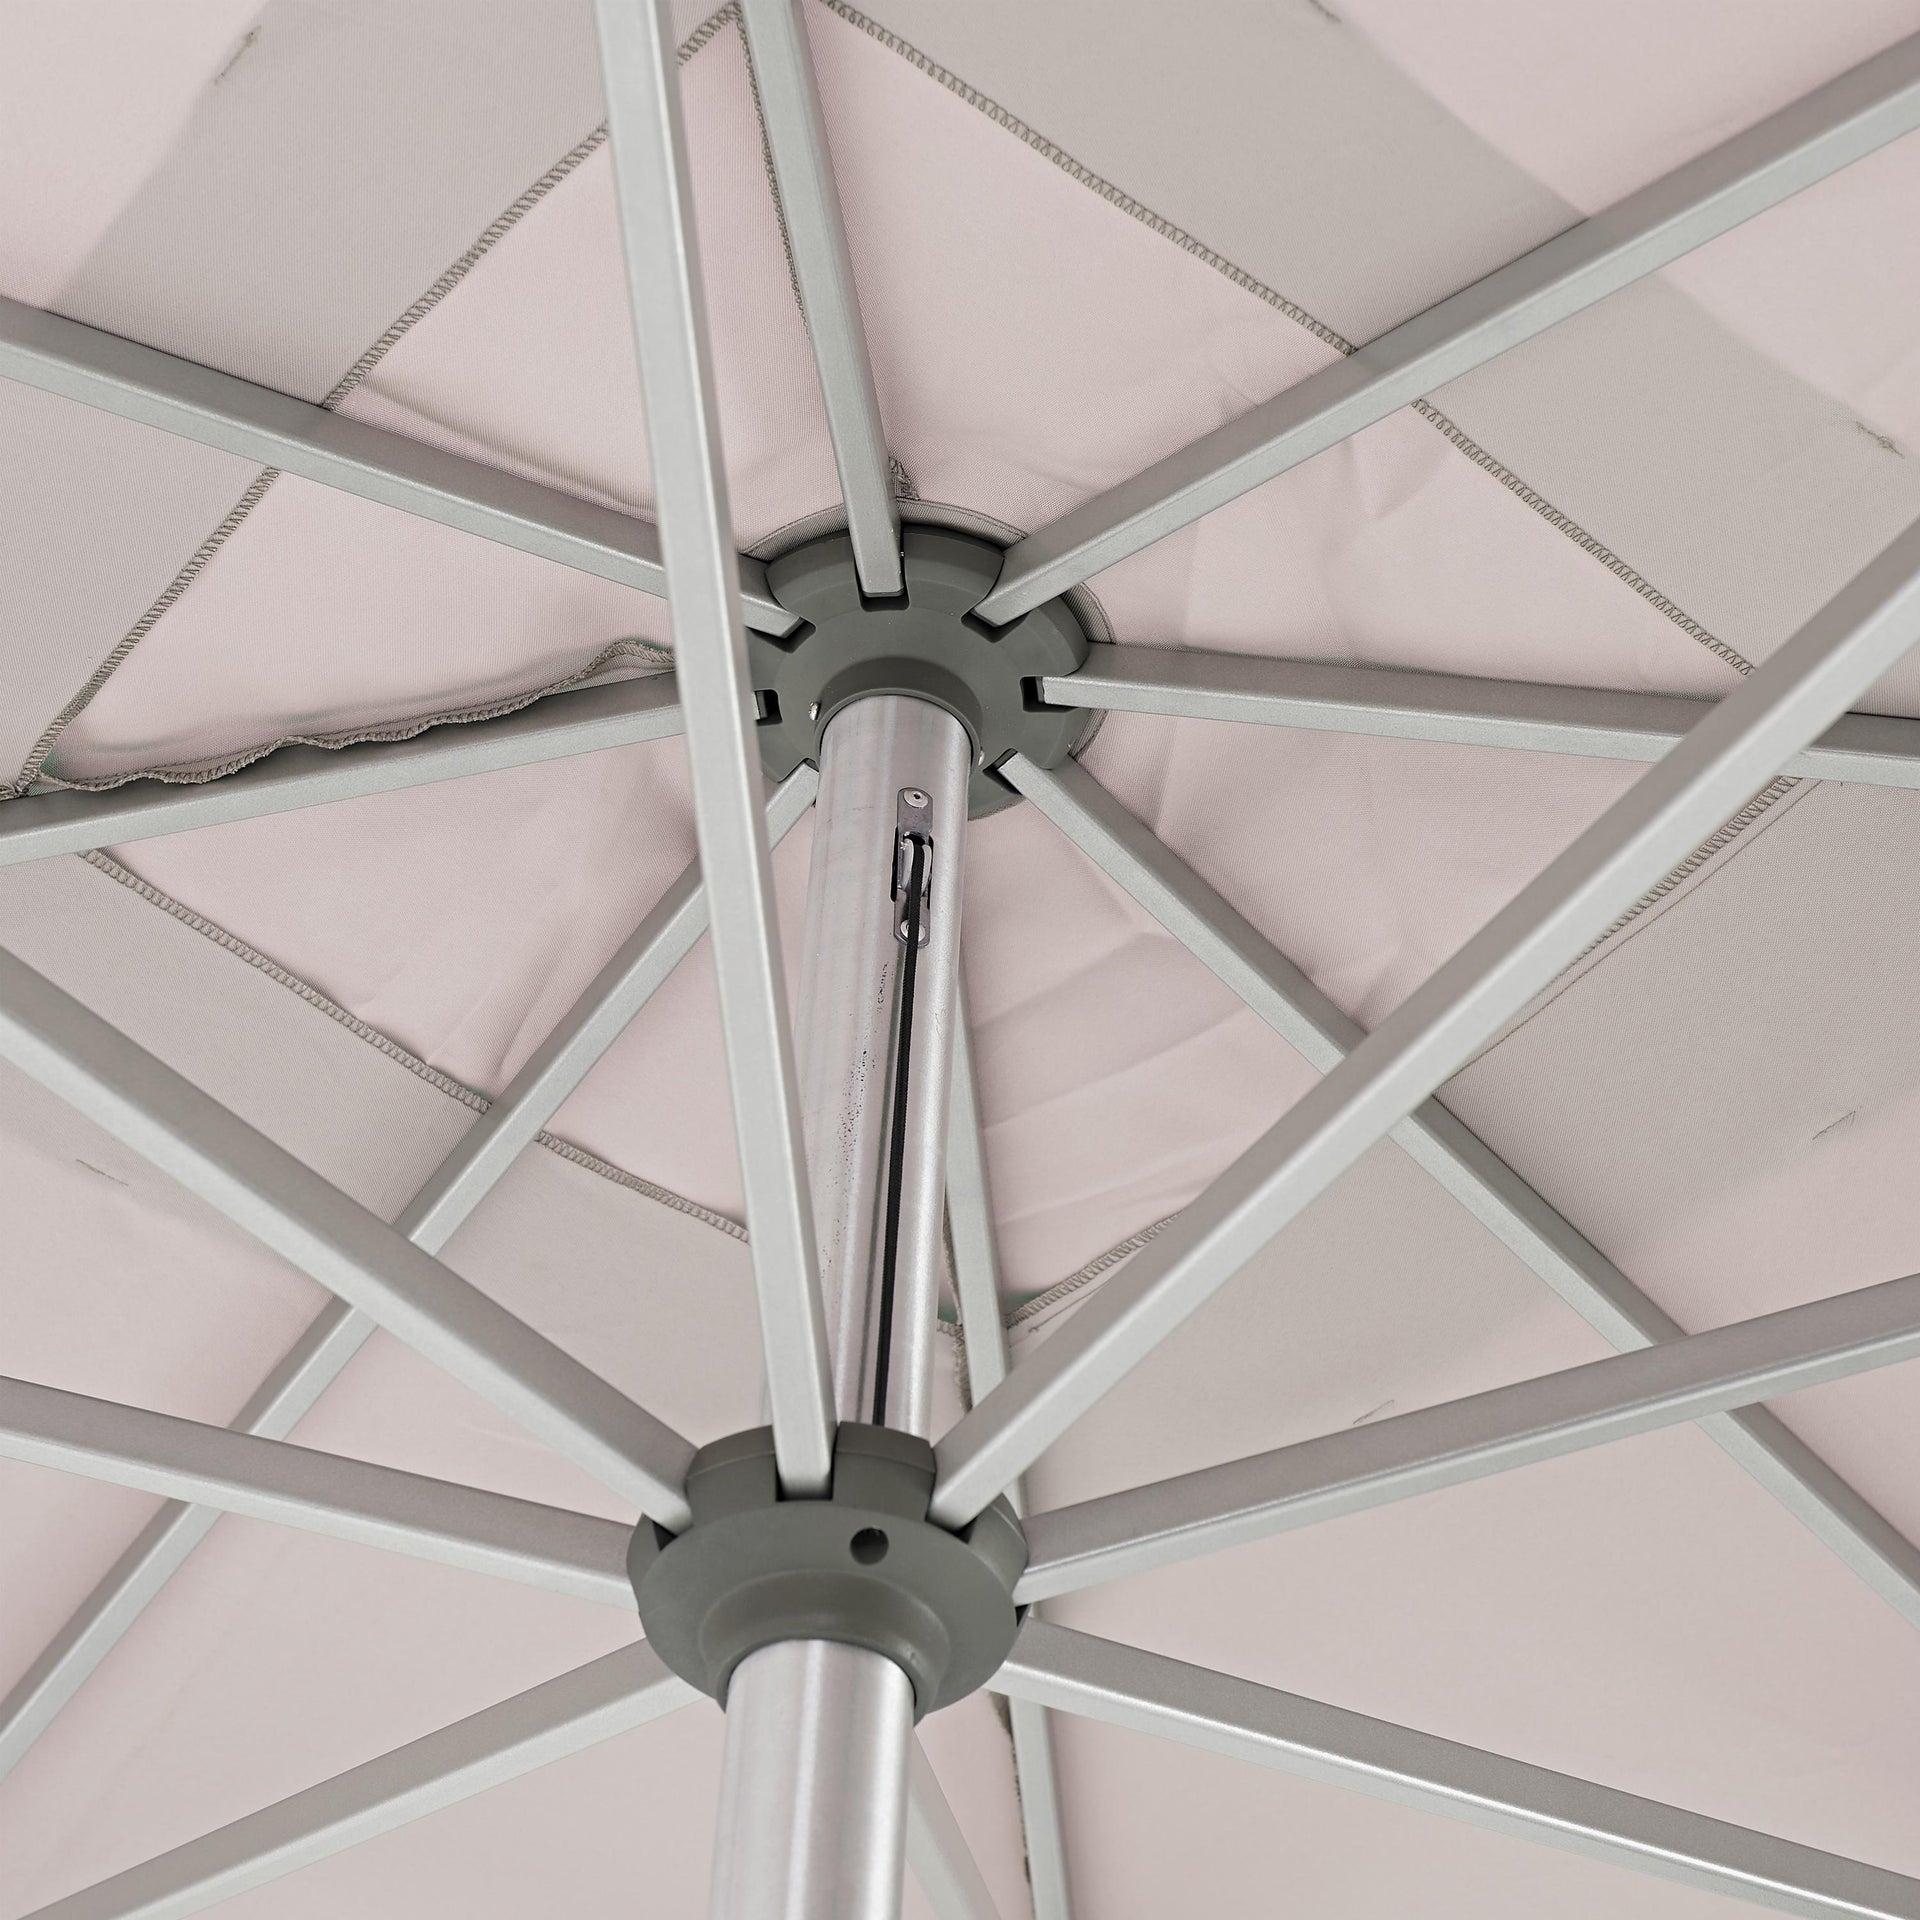 Ombrellone NATERIAL Aura L 2.85 x P 2.85 m color tortora - 5